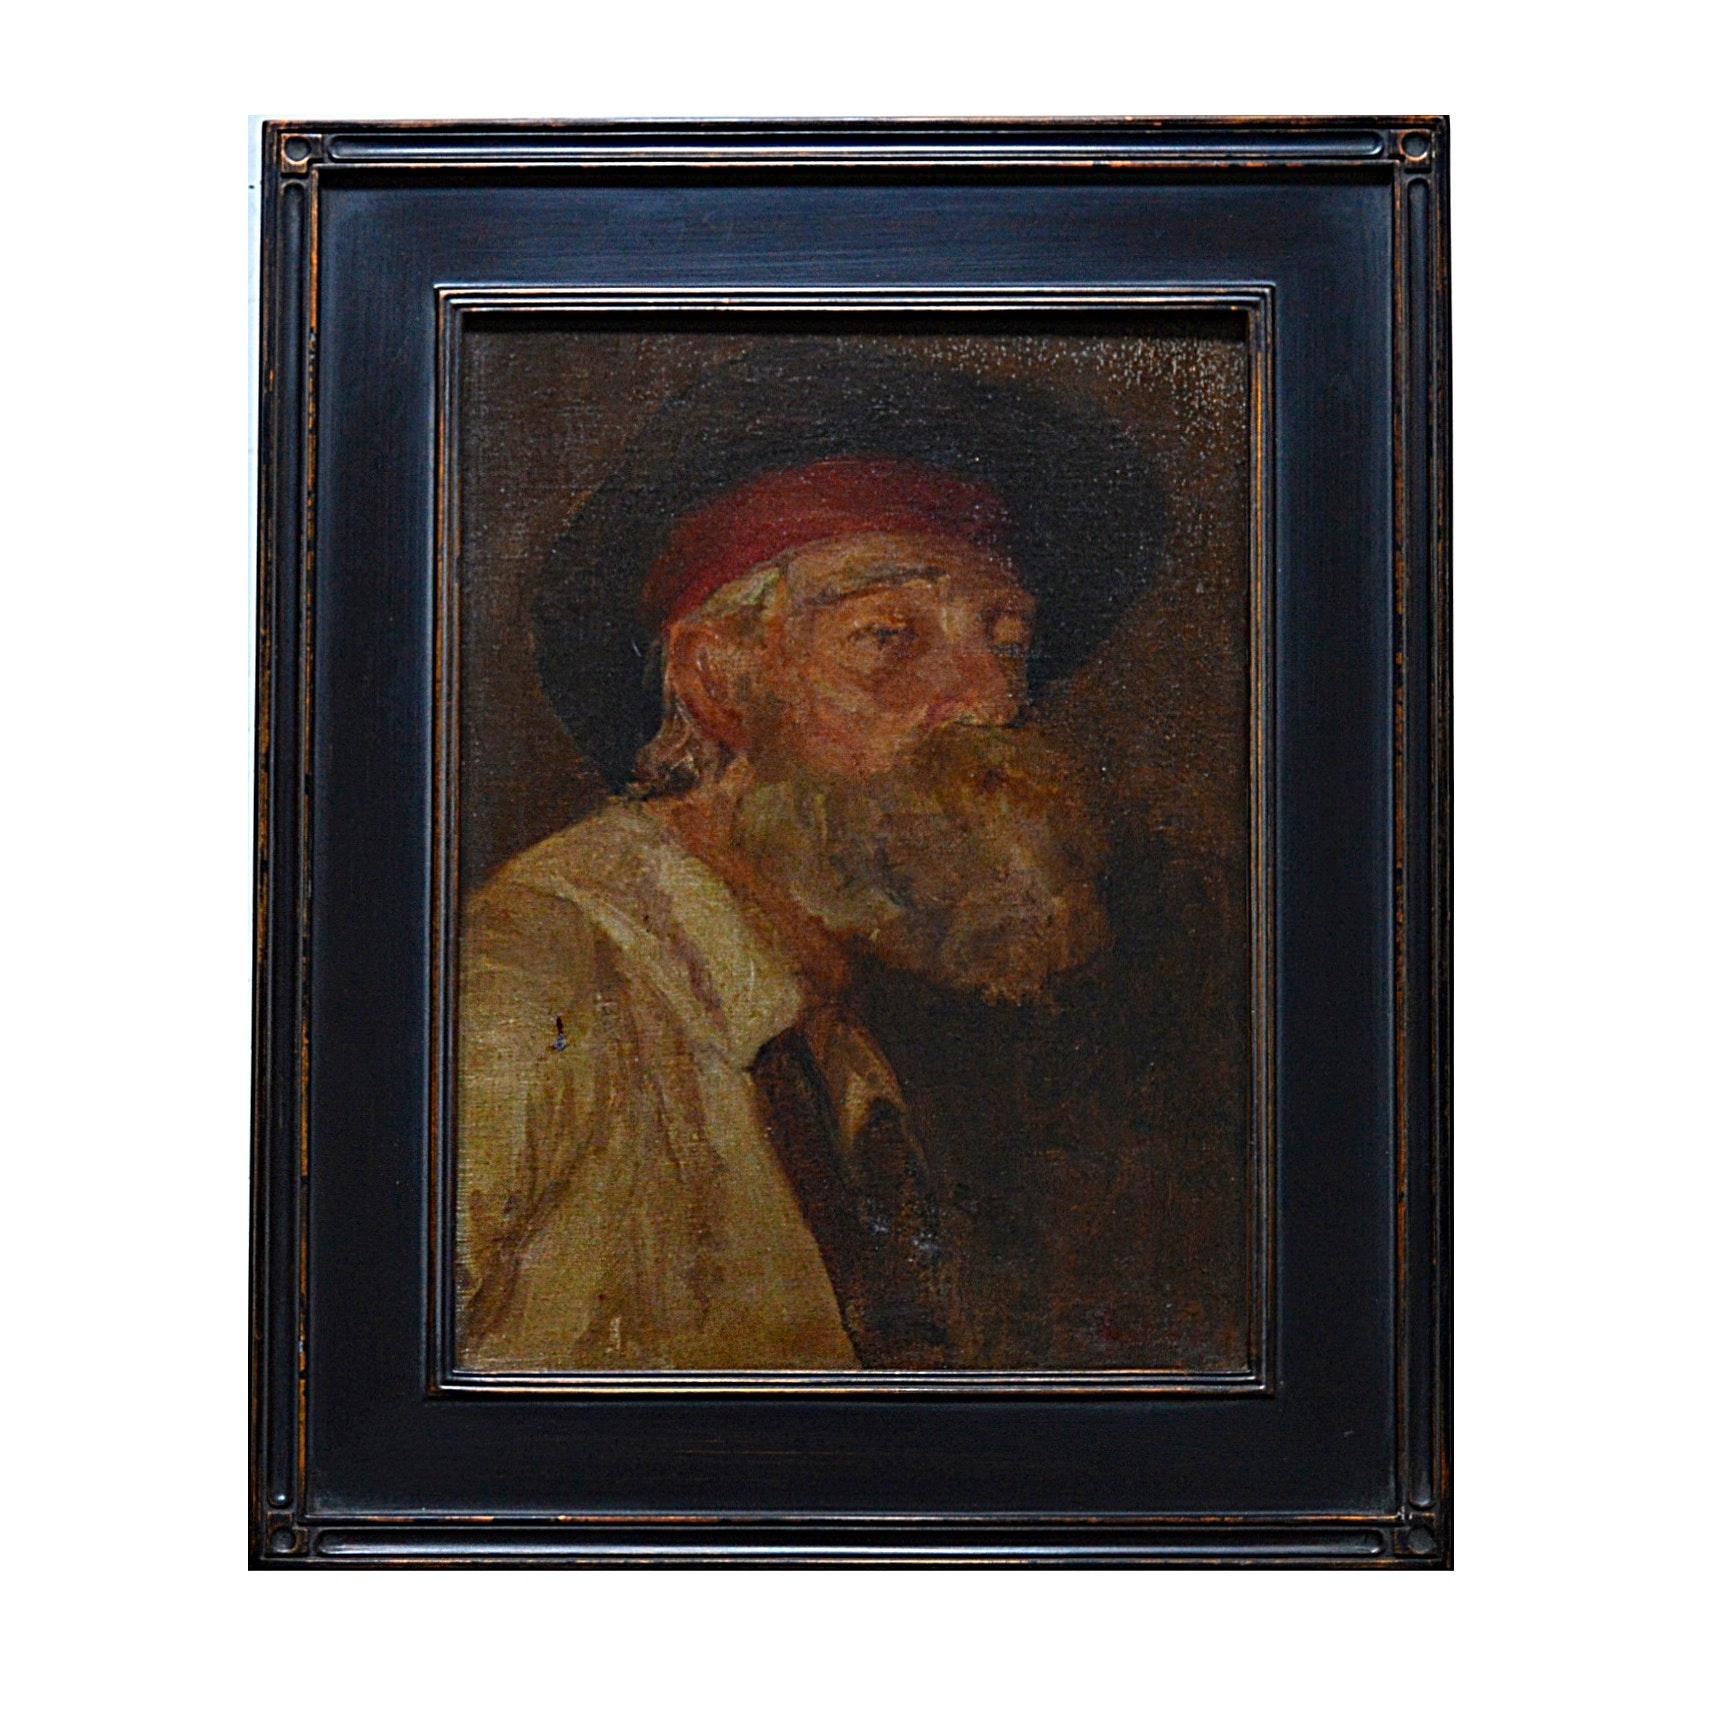 19th-Century Duveneck School/Munich School Oil on Canvas Portrait of a Man